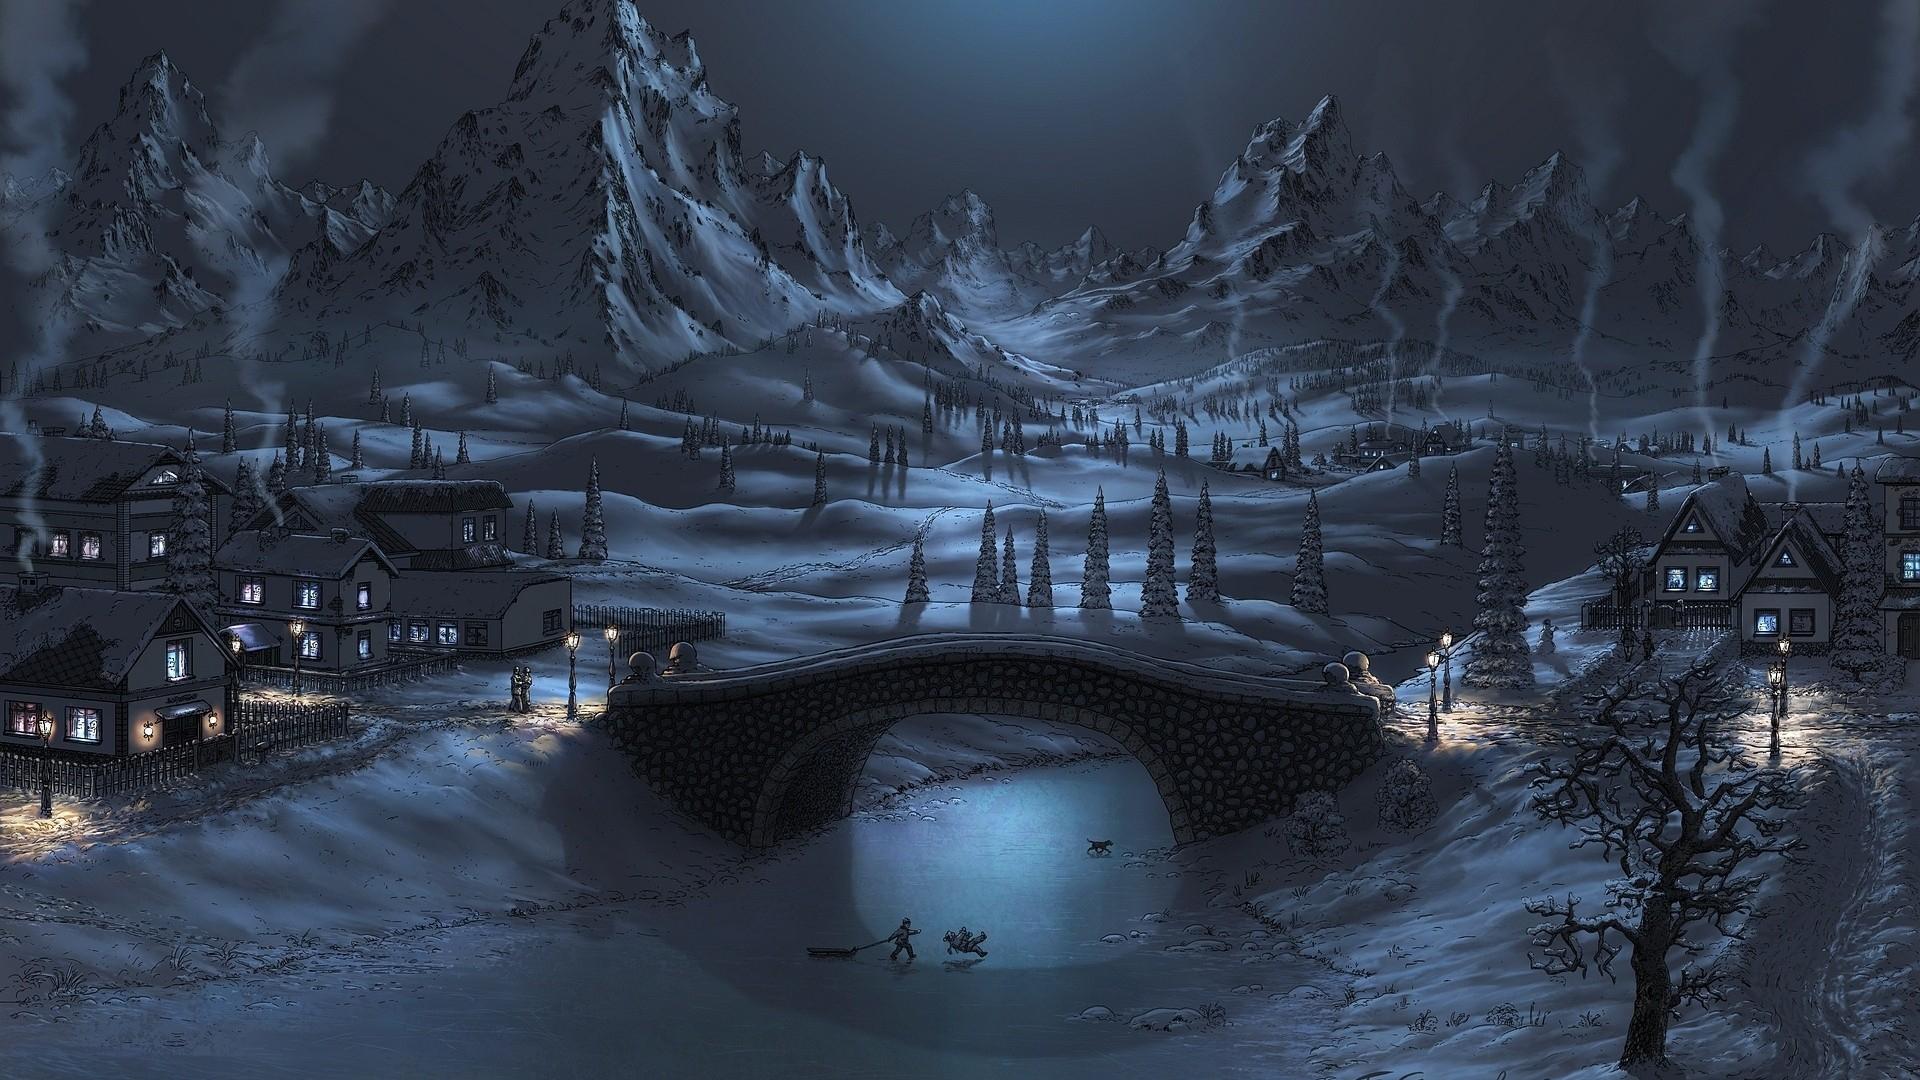 1920x1080 Snowy Landscape Drawing Snowy Landscape Drawing (1920x1080